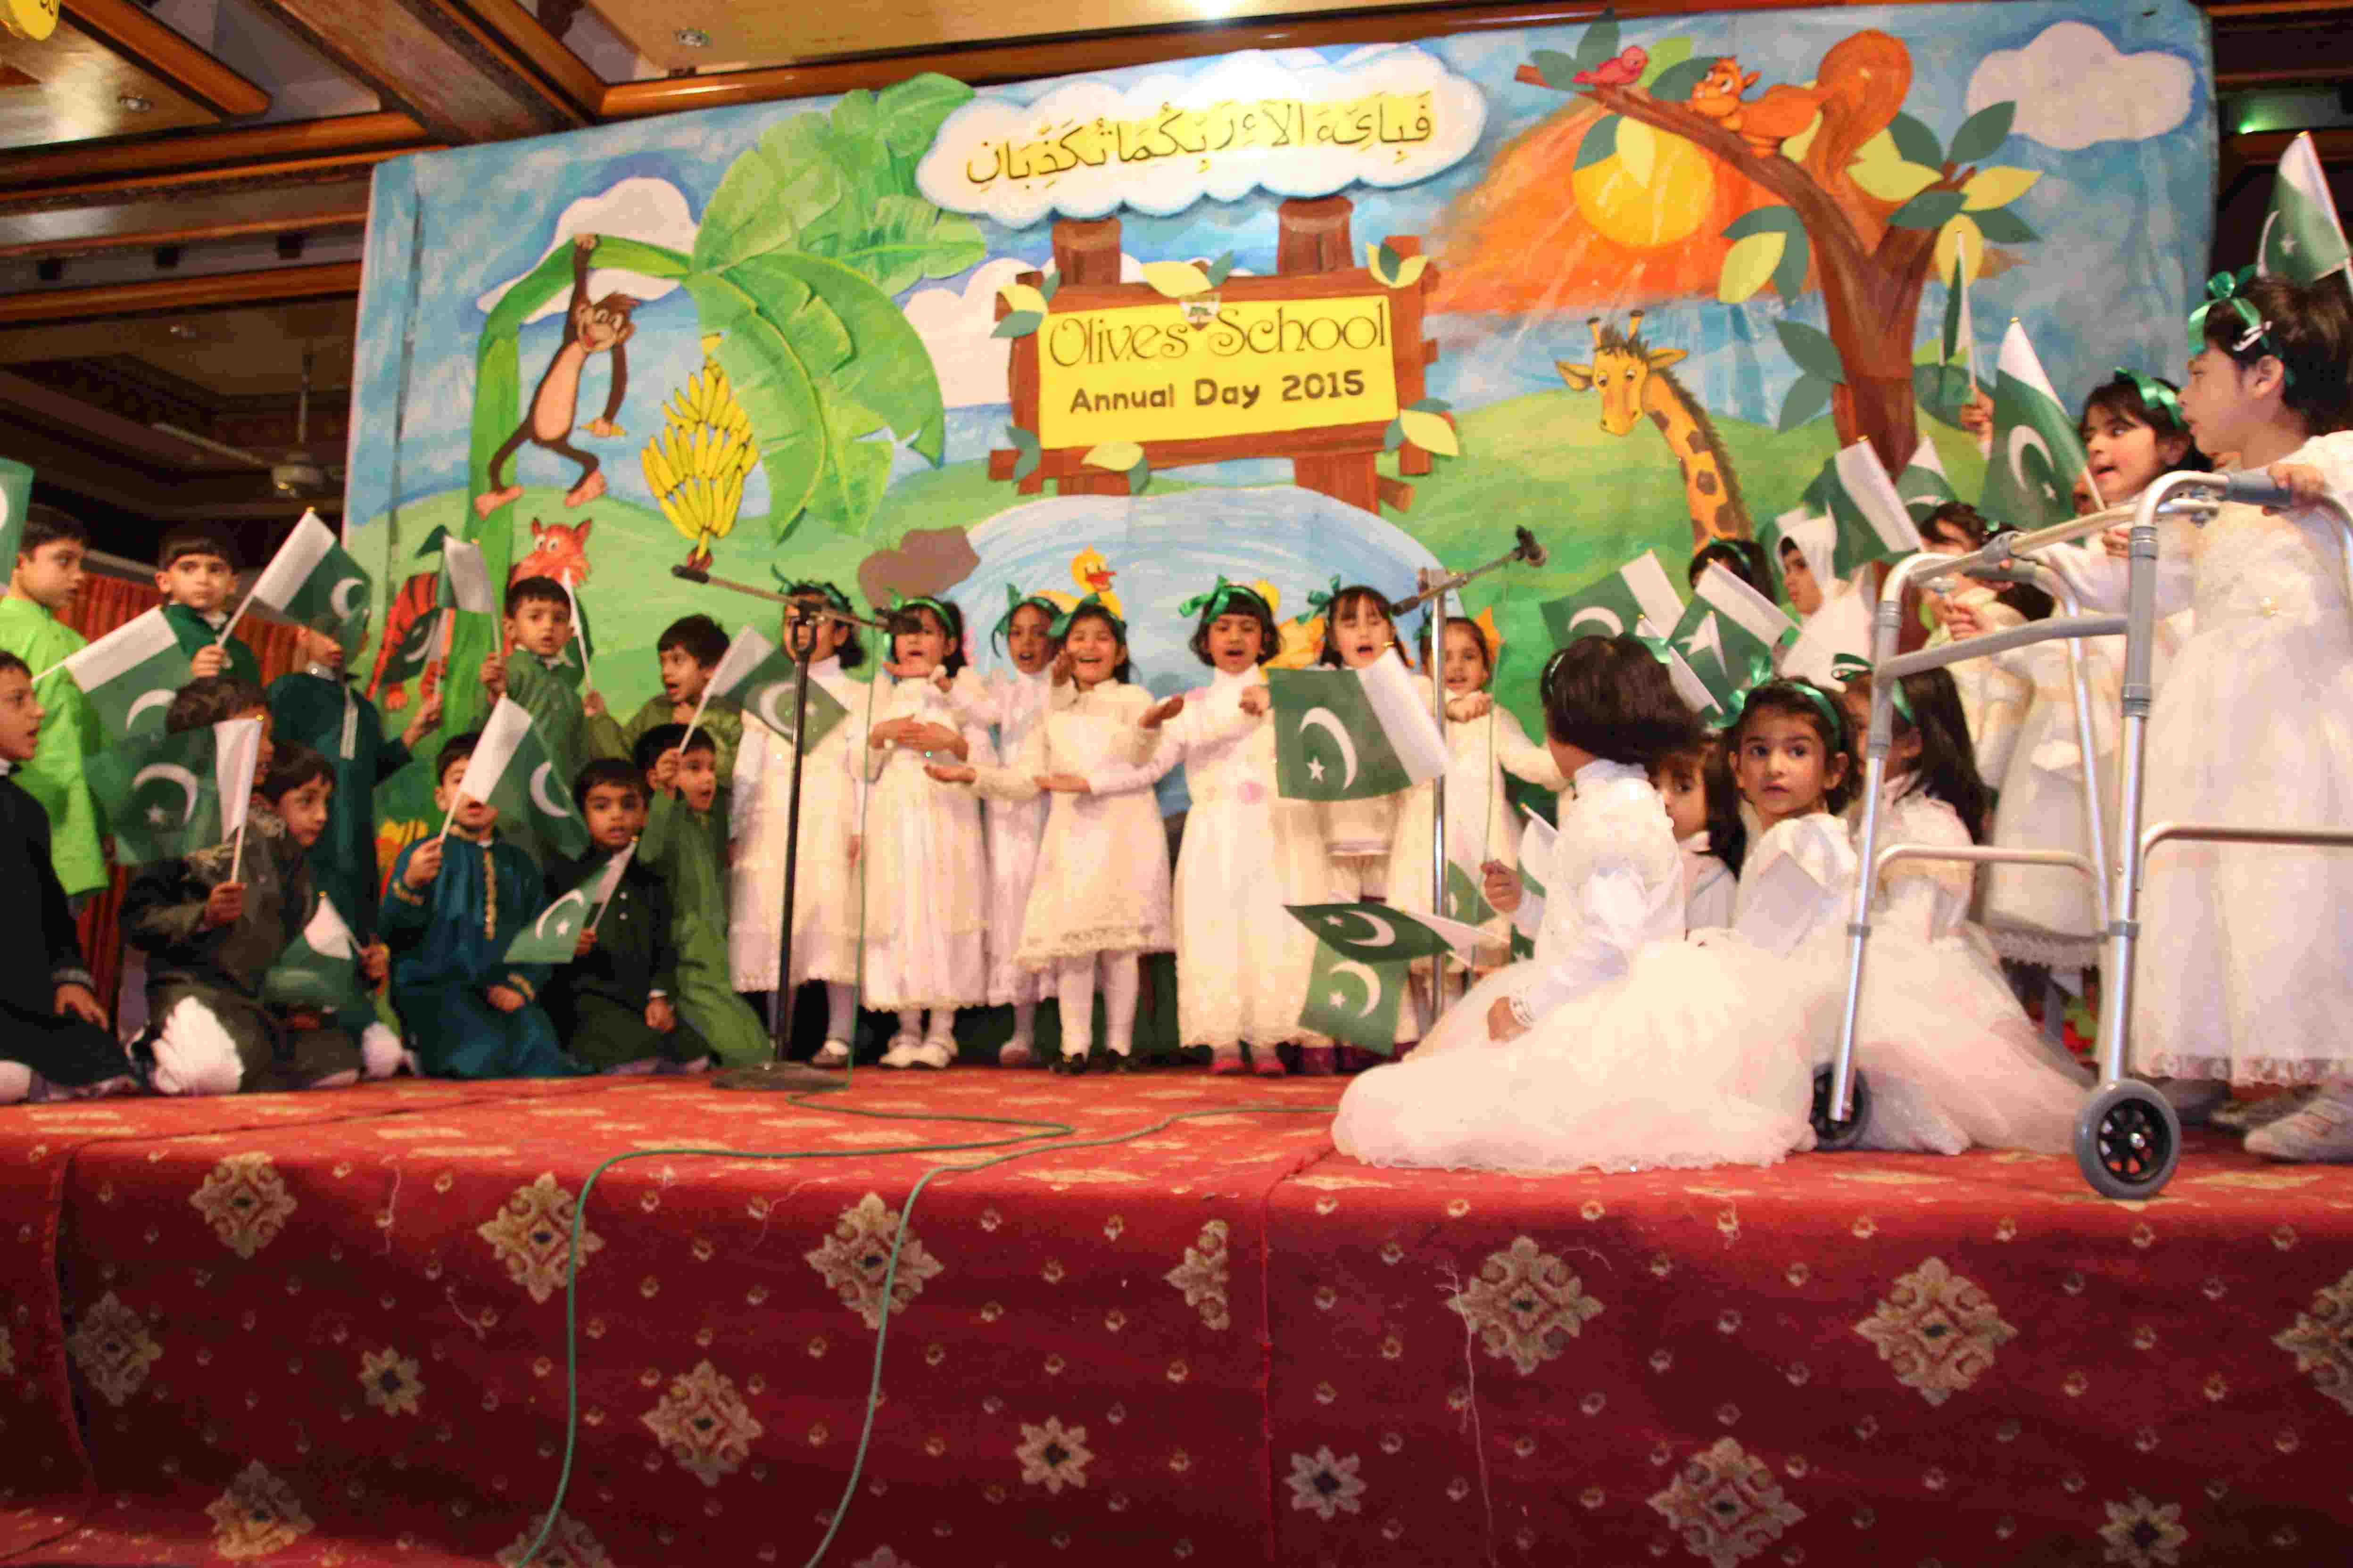 'Dais Humara Pakistan' by KG-1